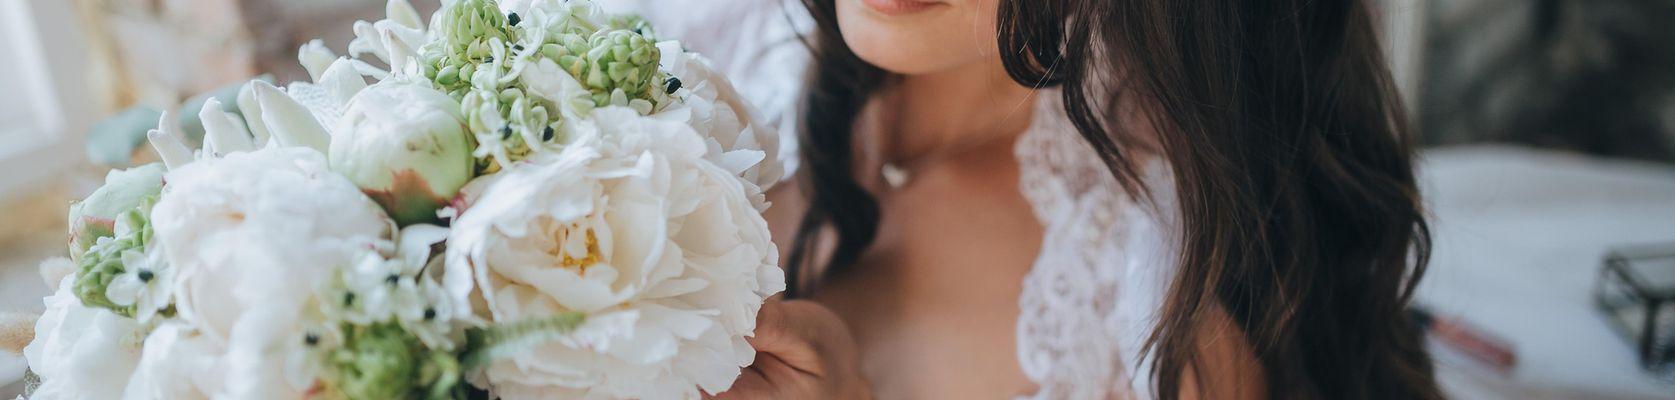 Styling Hochzeit, Brautstyling, Hochzeitsstyling, Beauty, Weddingstyling